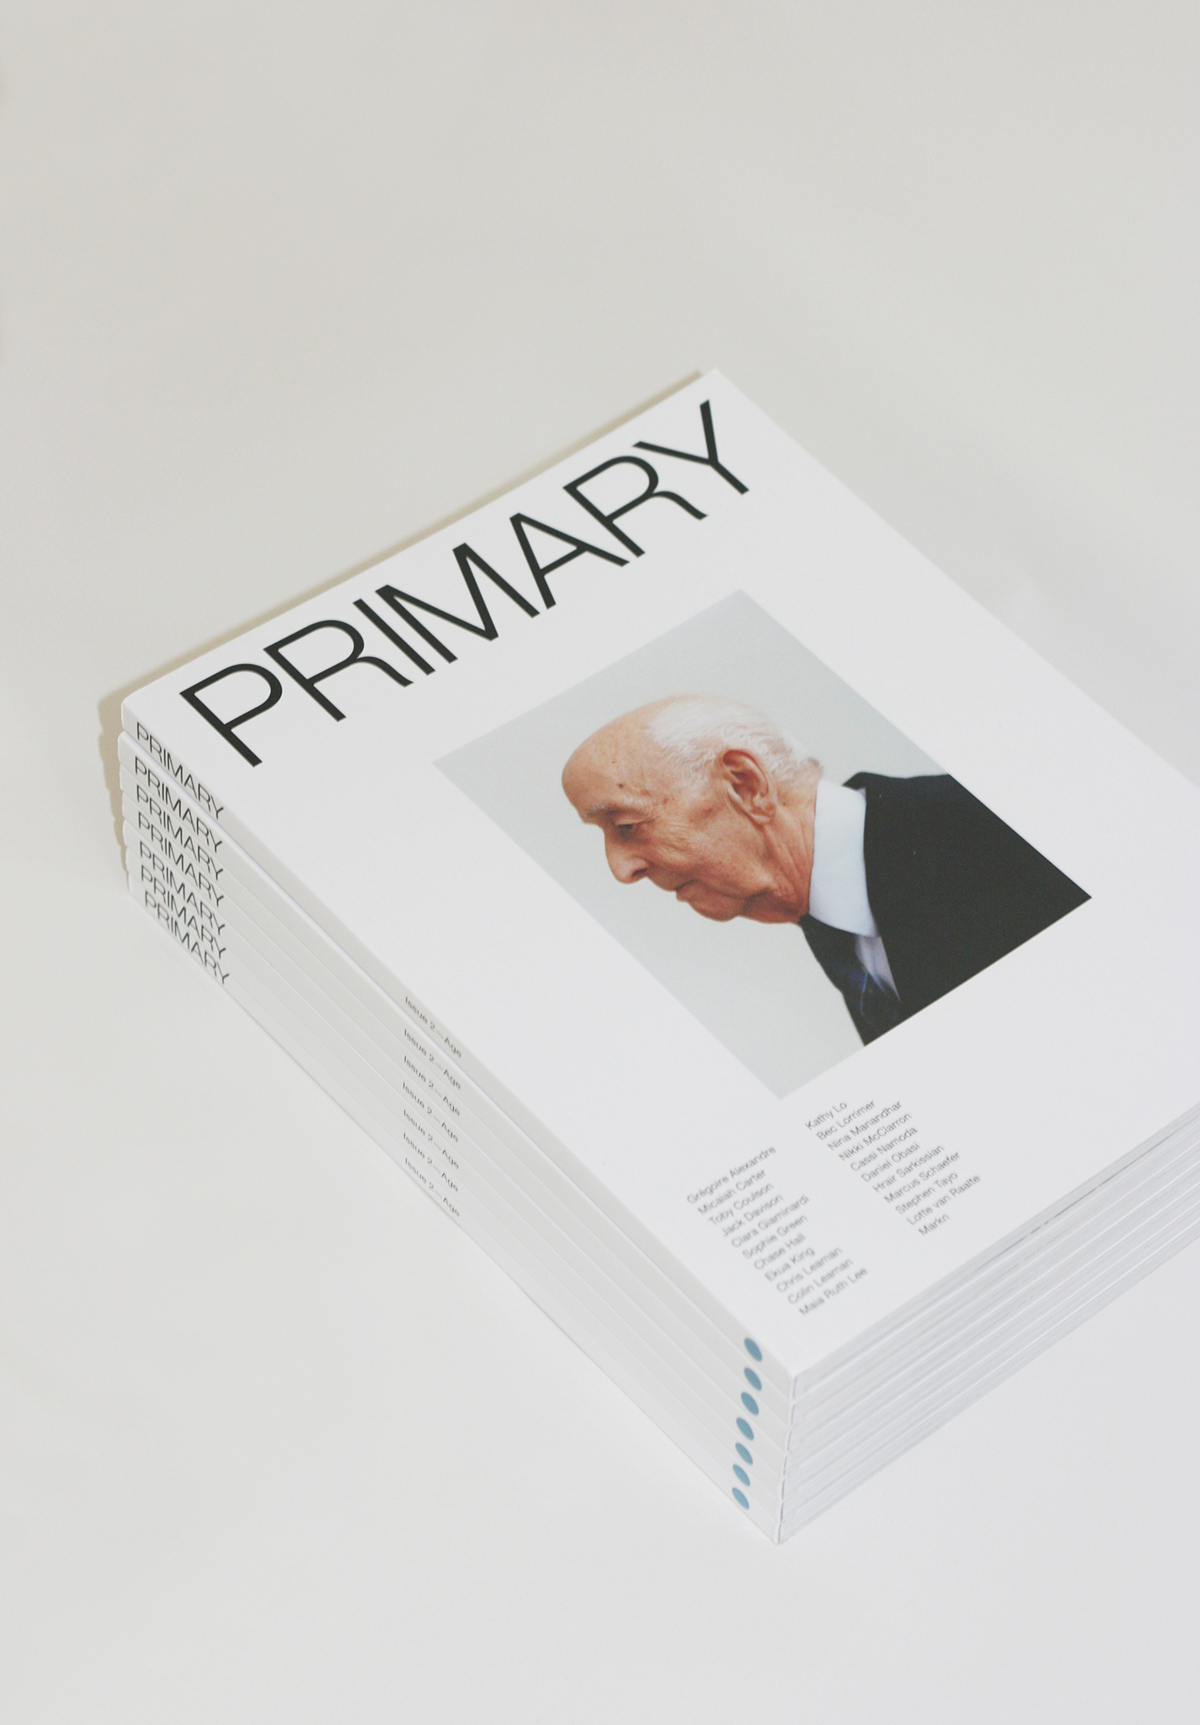 Primary Issue2 4